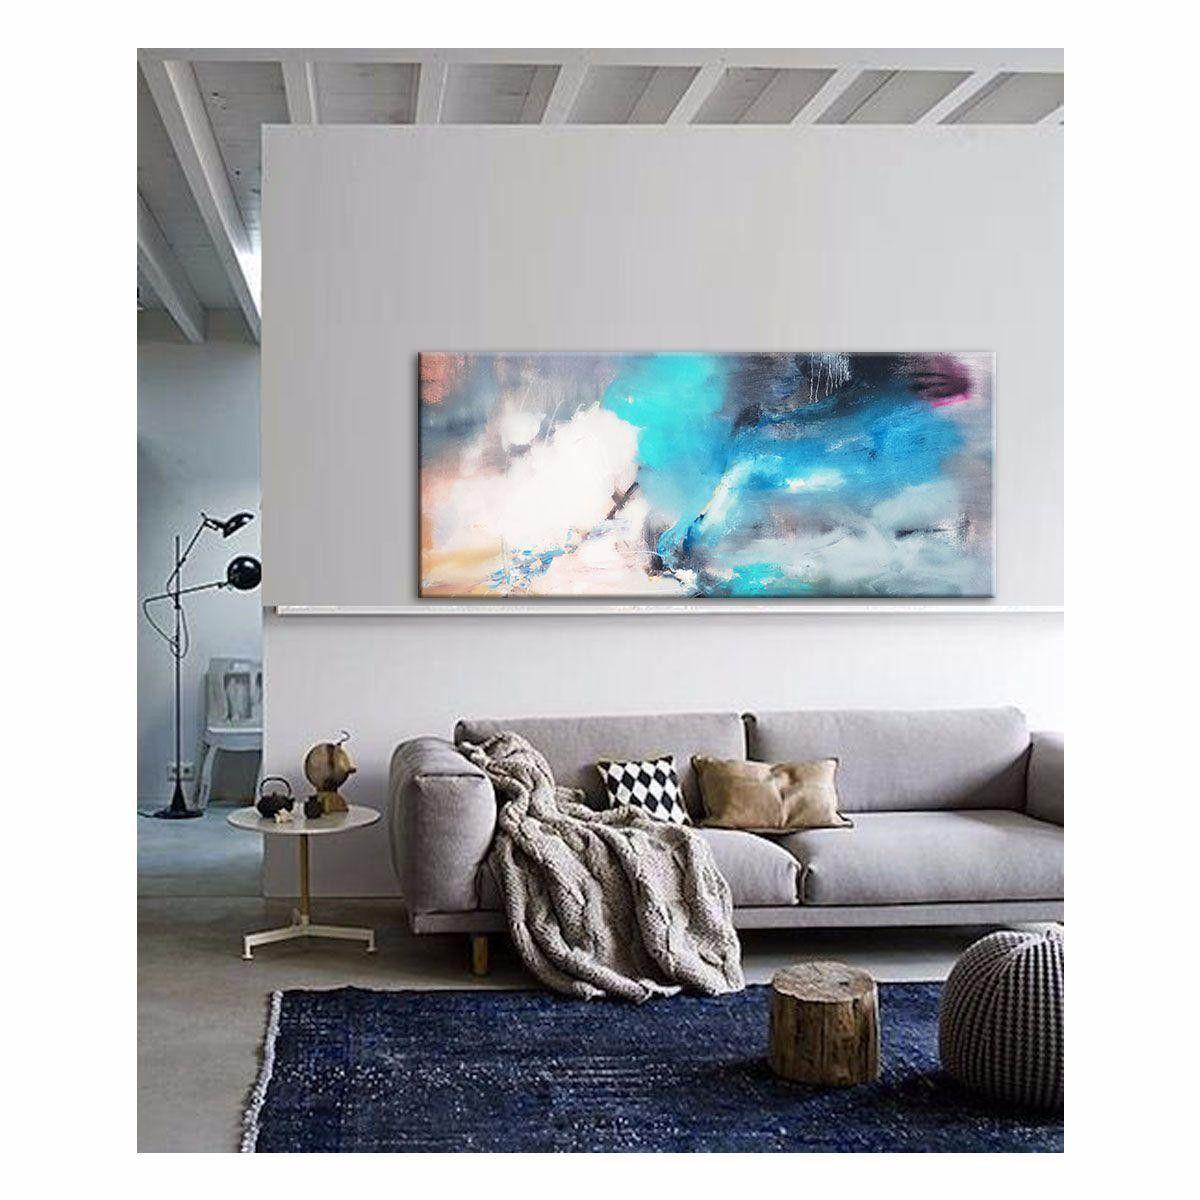 The home larger than life deals large canvas artartwork